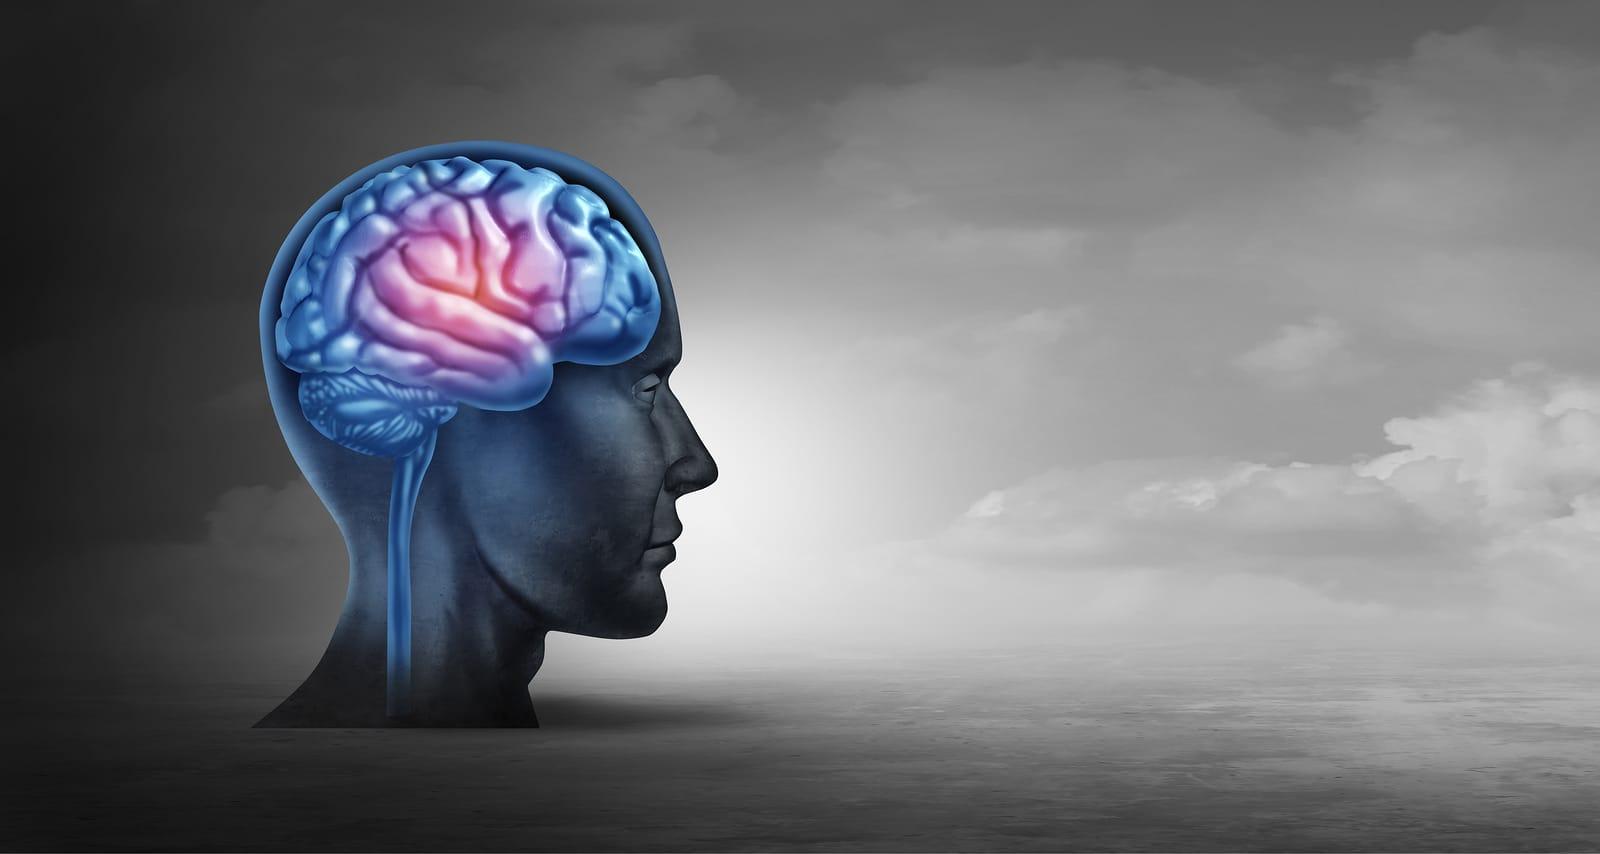 lllt helping brain memory